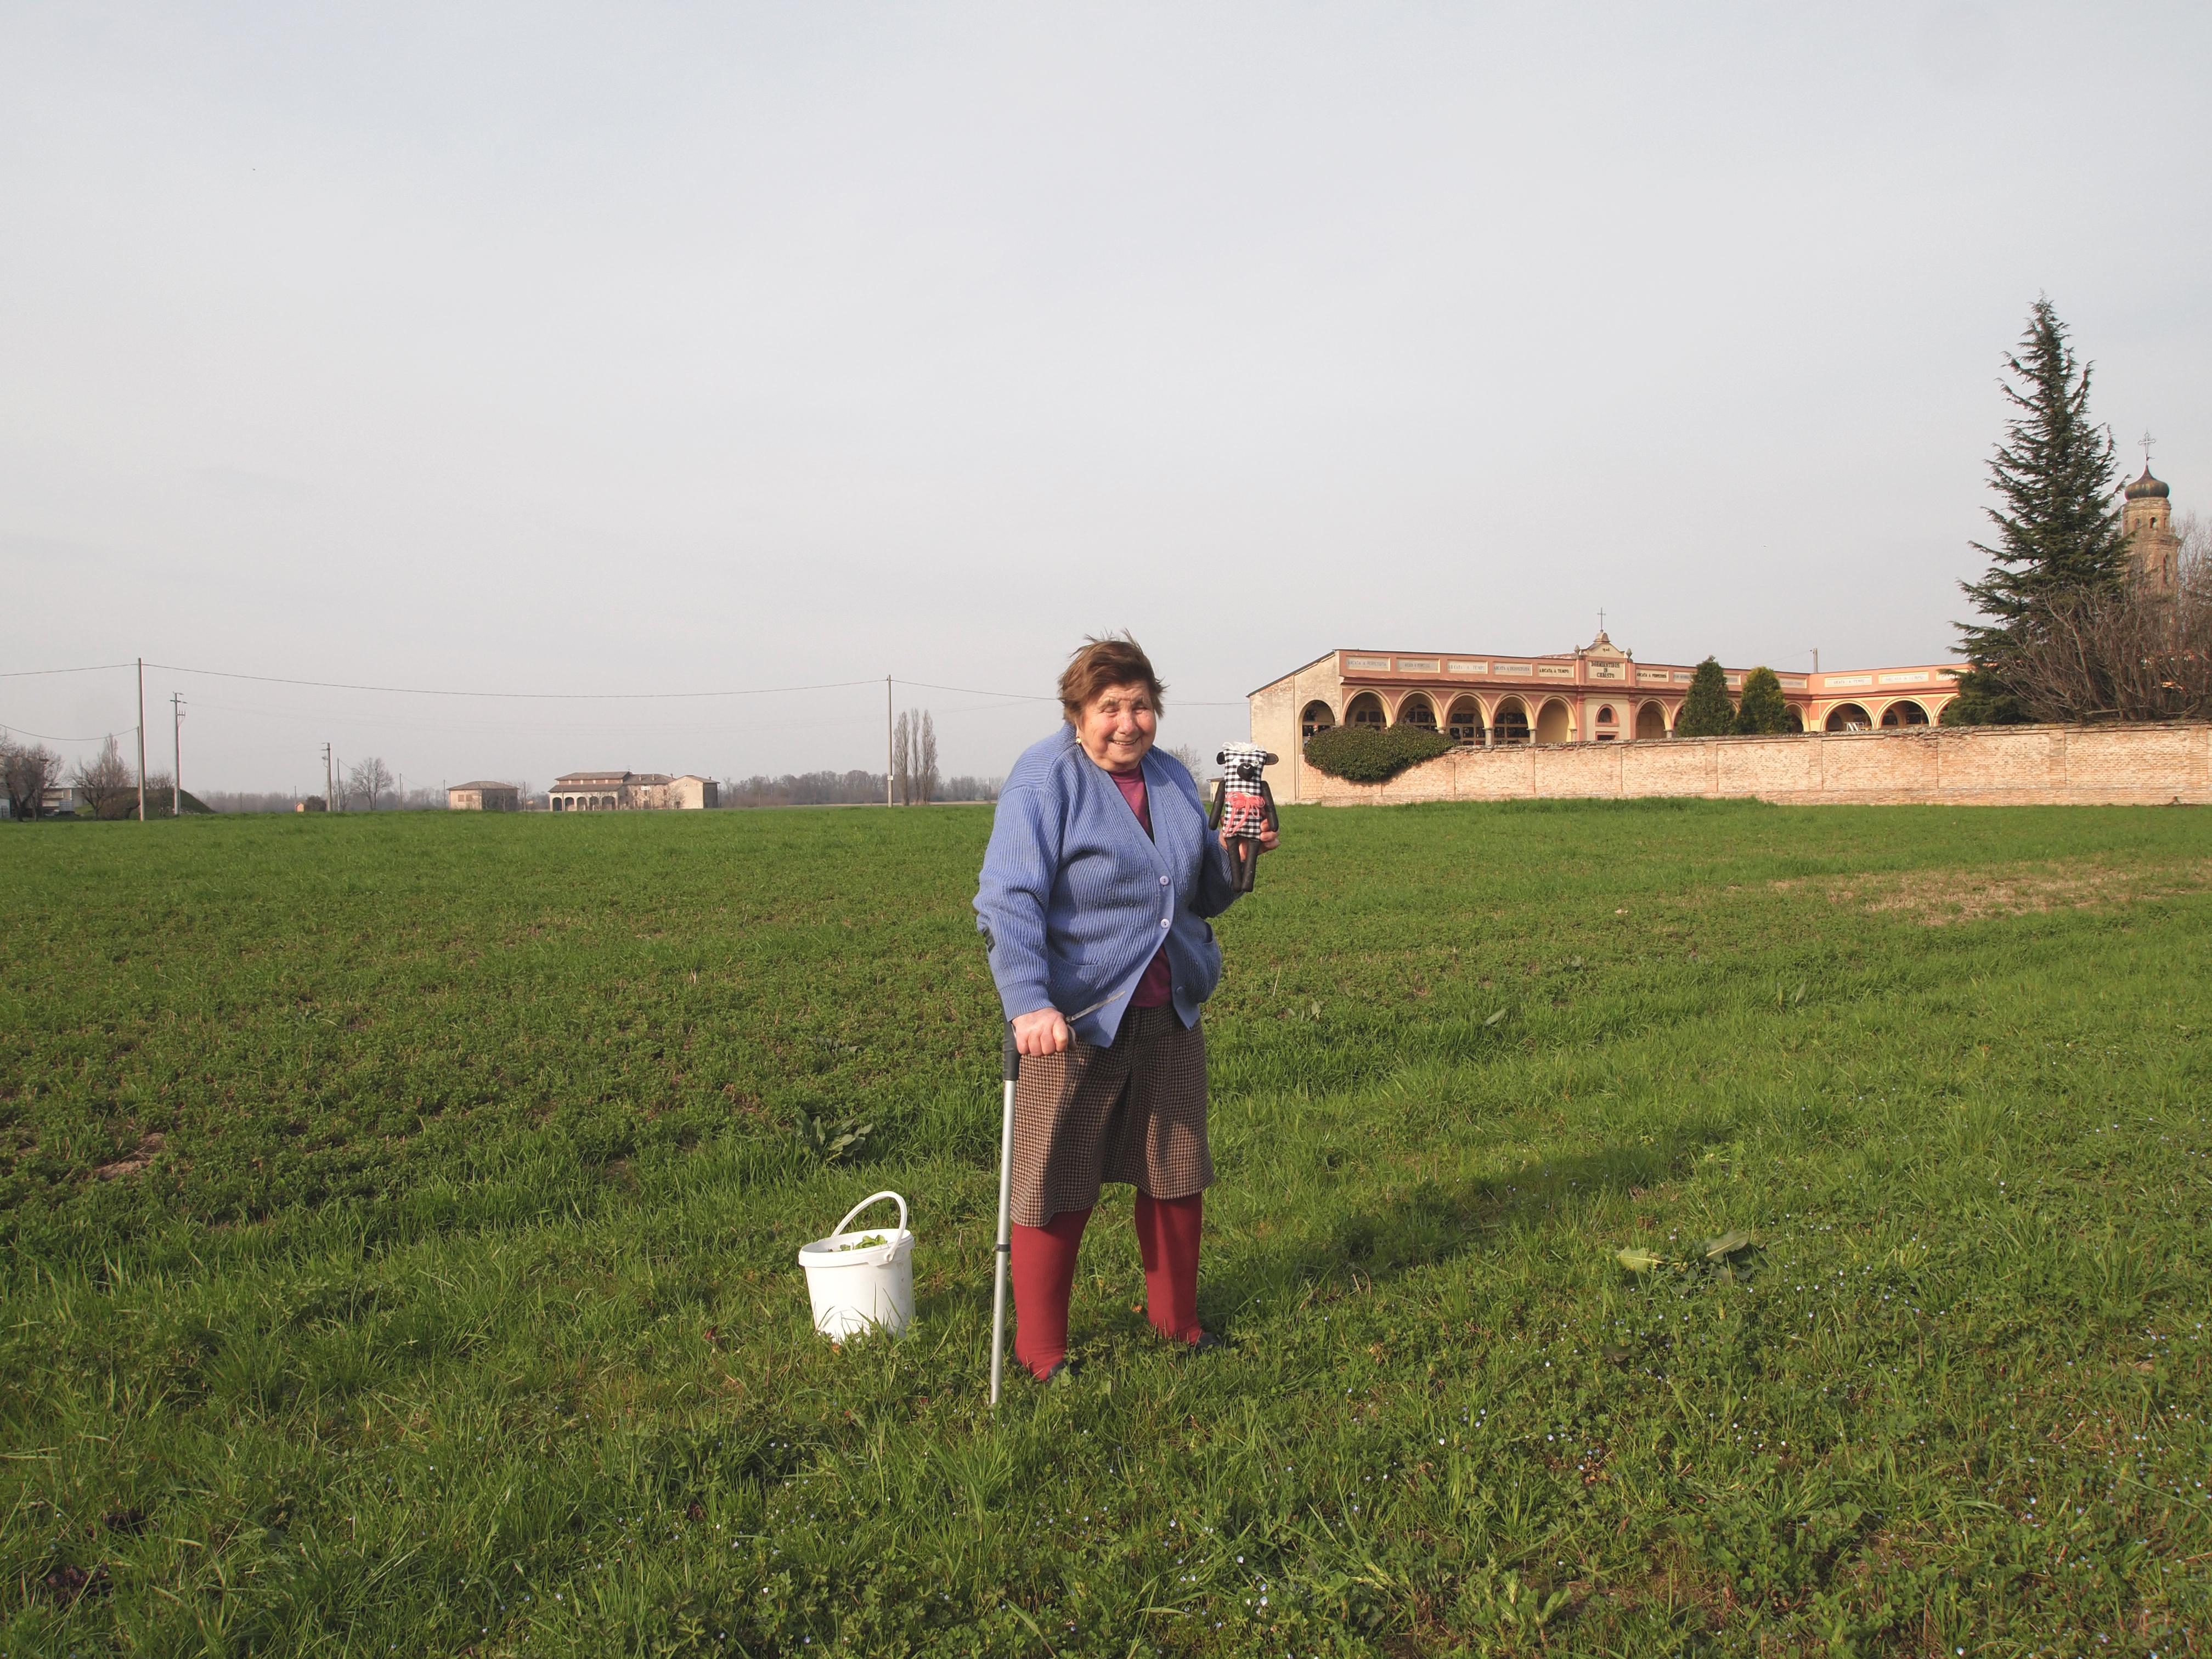 Campagna padana, Italia